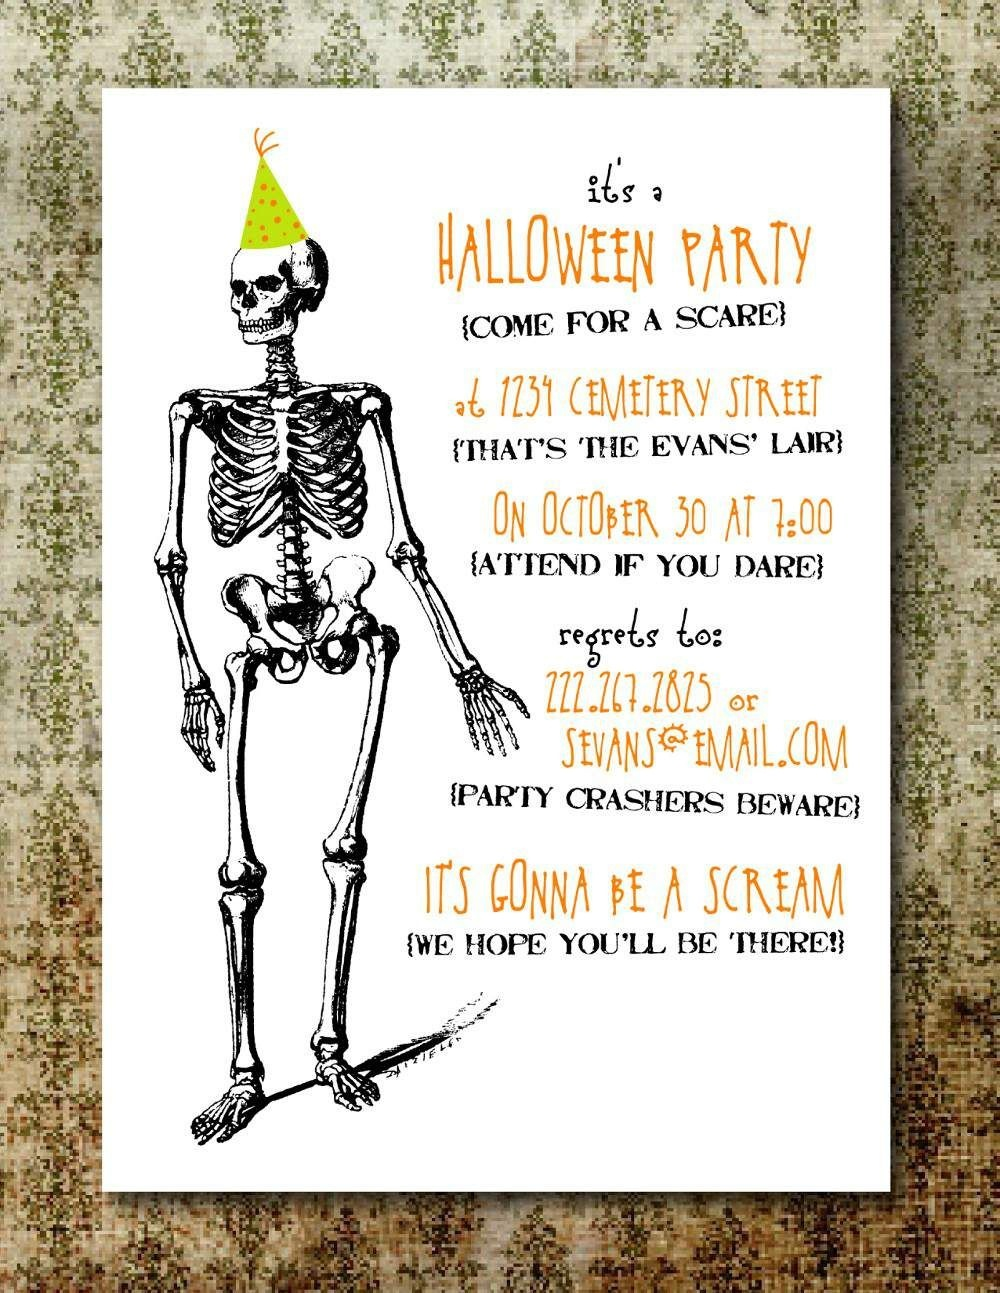 Free Printable Halloween Invitation Templates | Free Printable - Halloween Invitations Free Printable Black And White